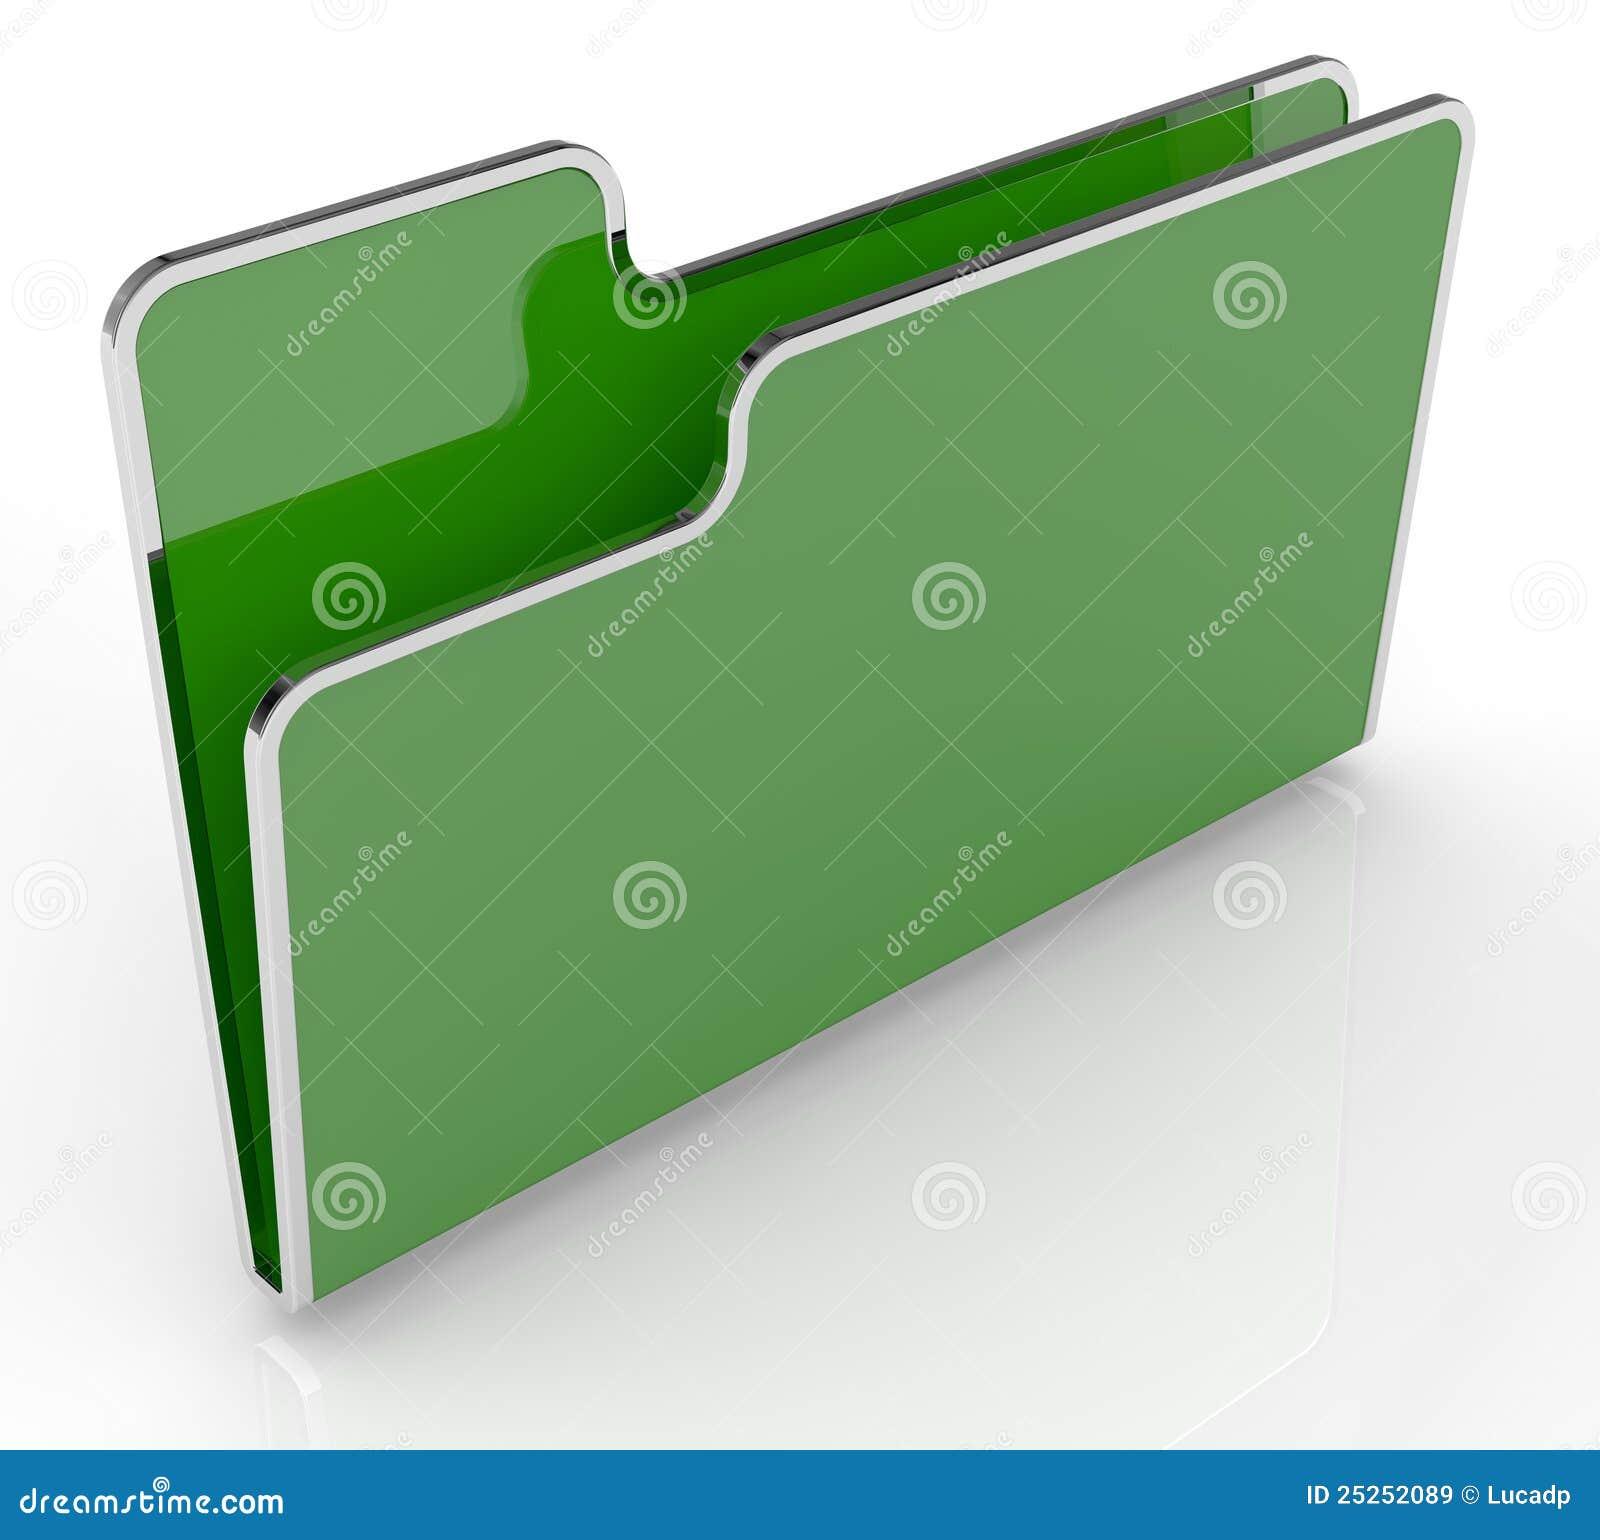 how to add folders on chrme